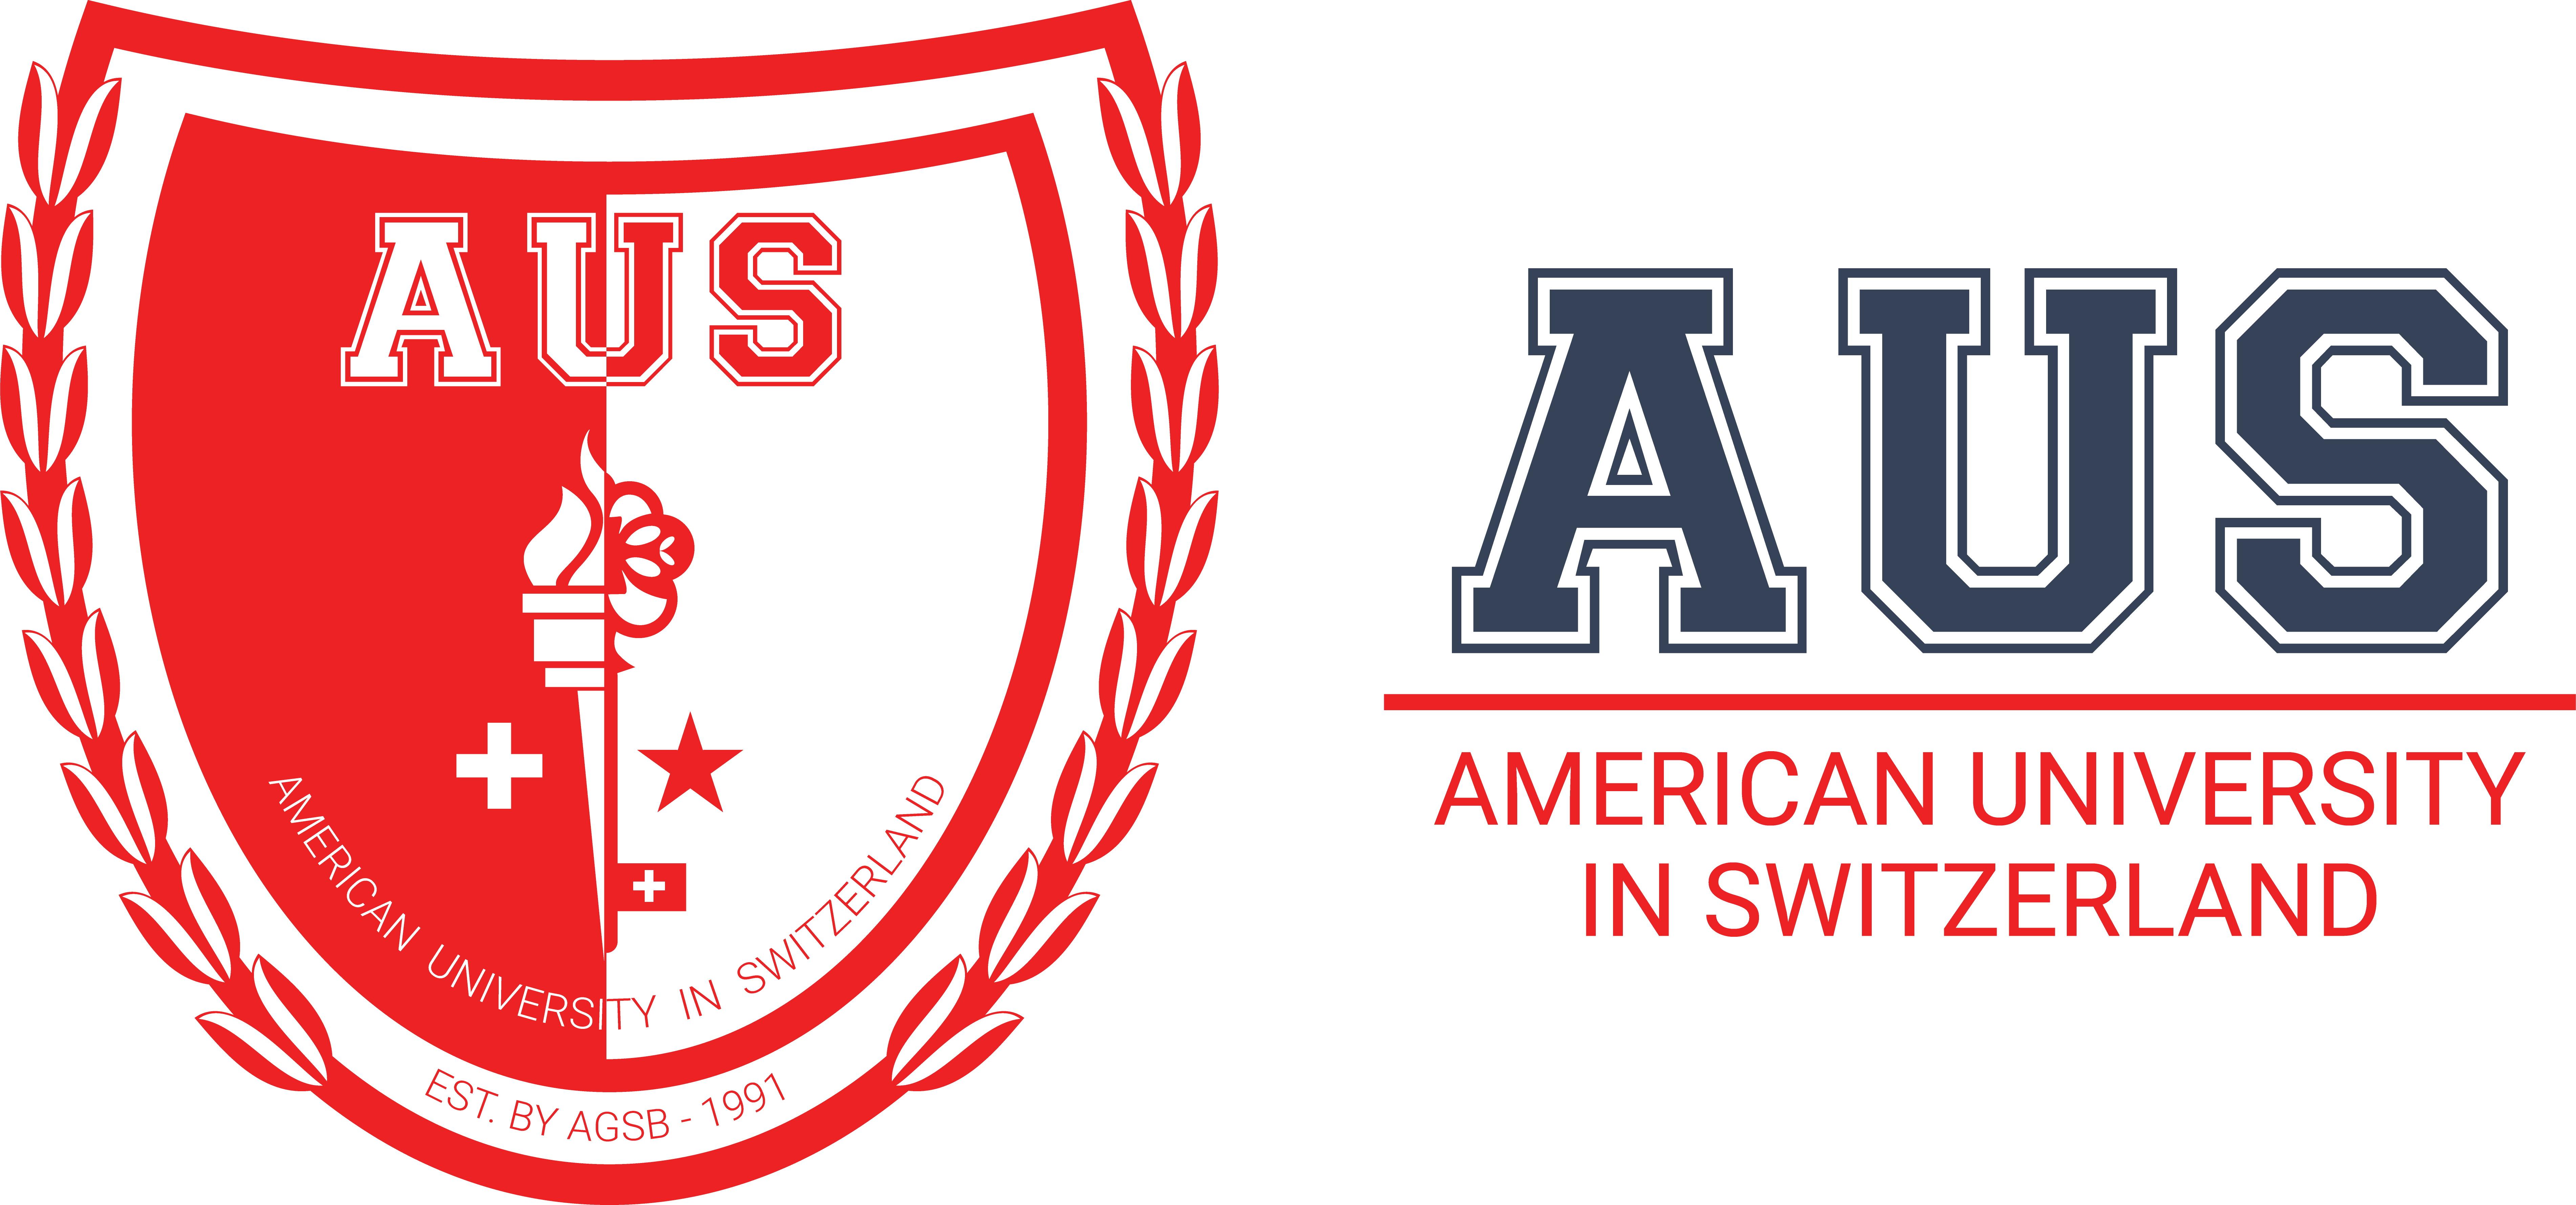 AUS American University in Switzerland